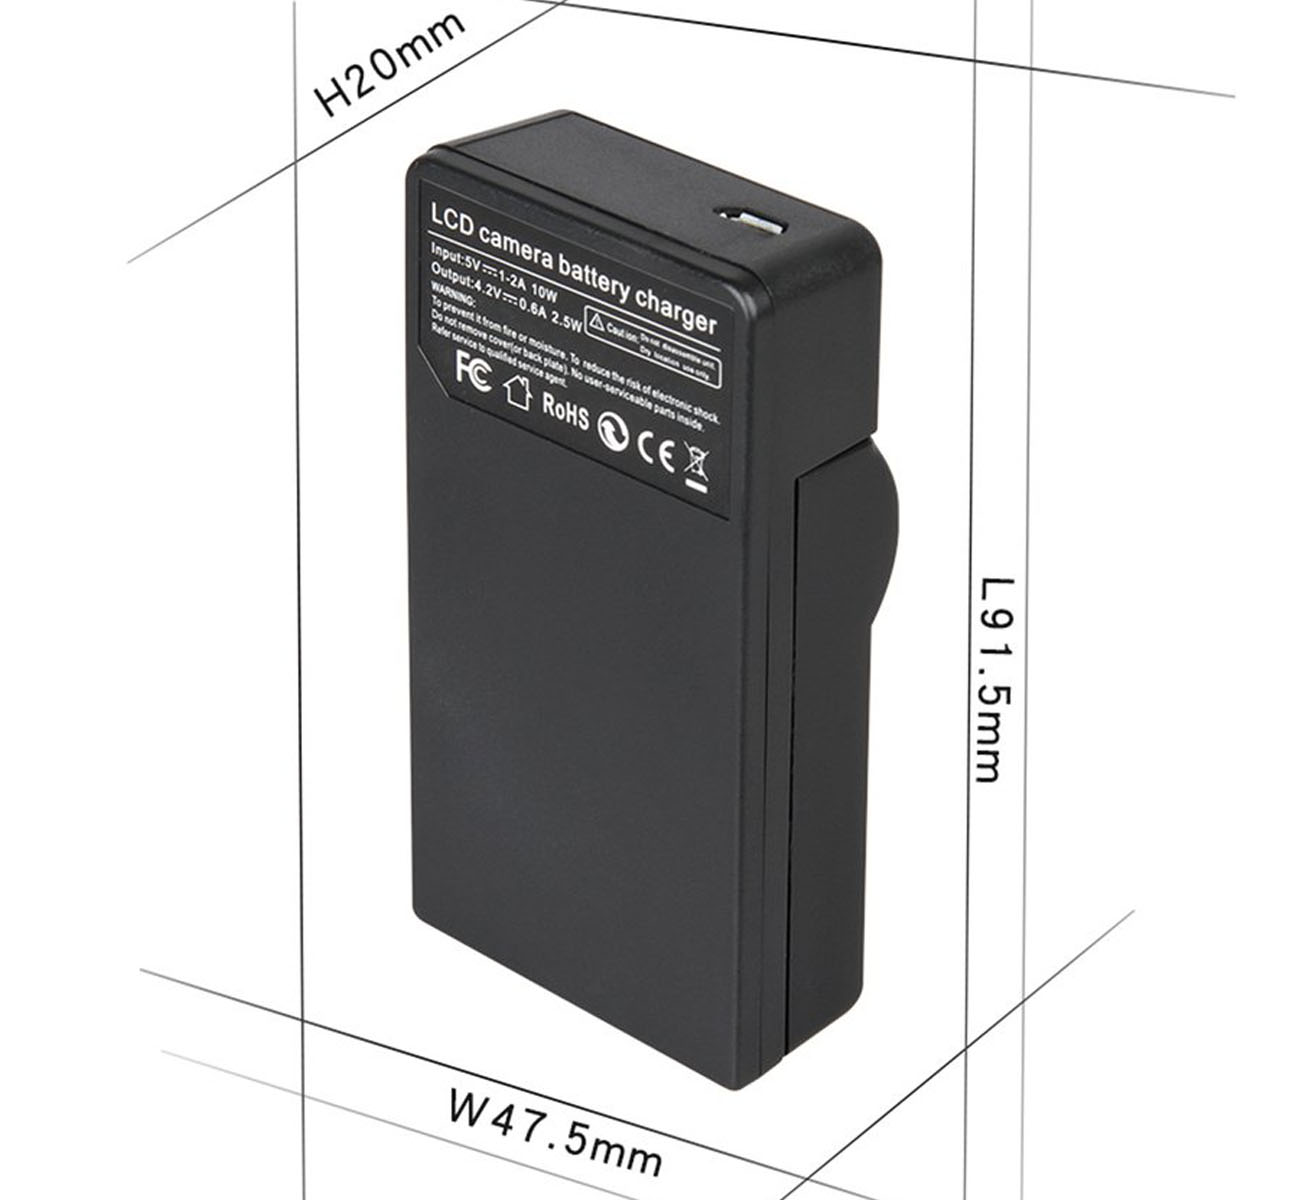 GZ-HM330SEU GZ-HM330SEK HD Flash Memory Camcorder Smart Slim Micro USB Battery Charger for JVC Everio GZ-HM330SE